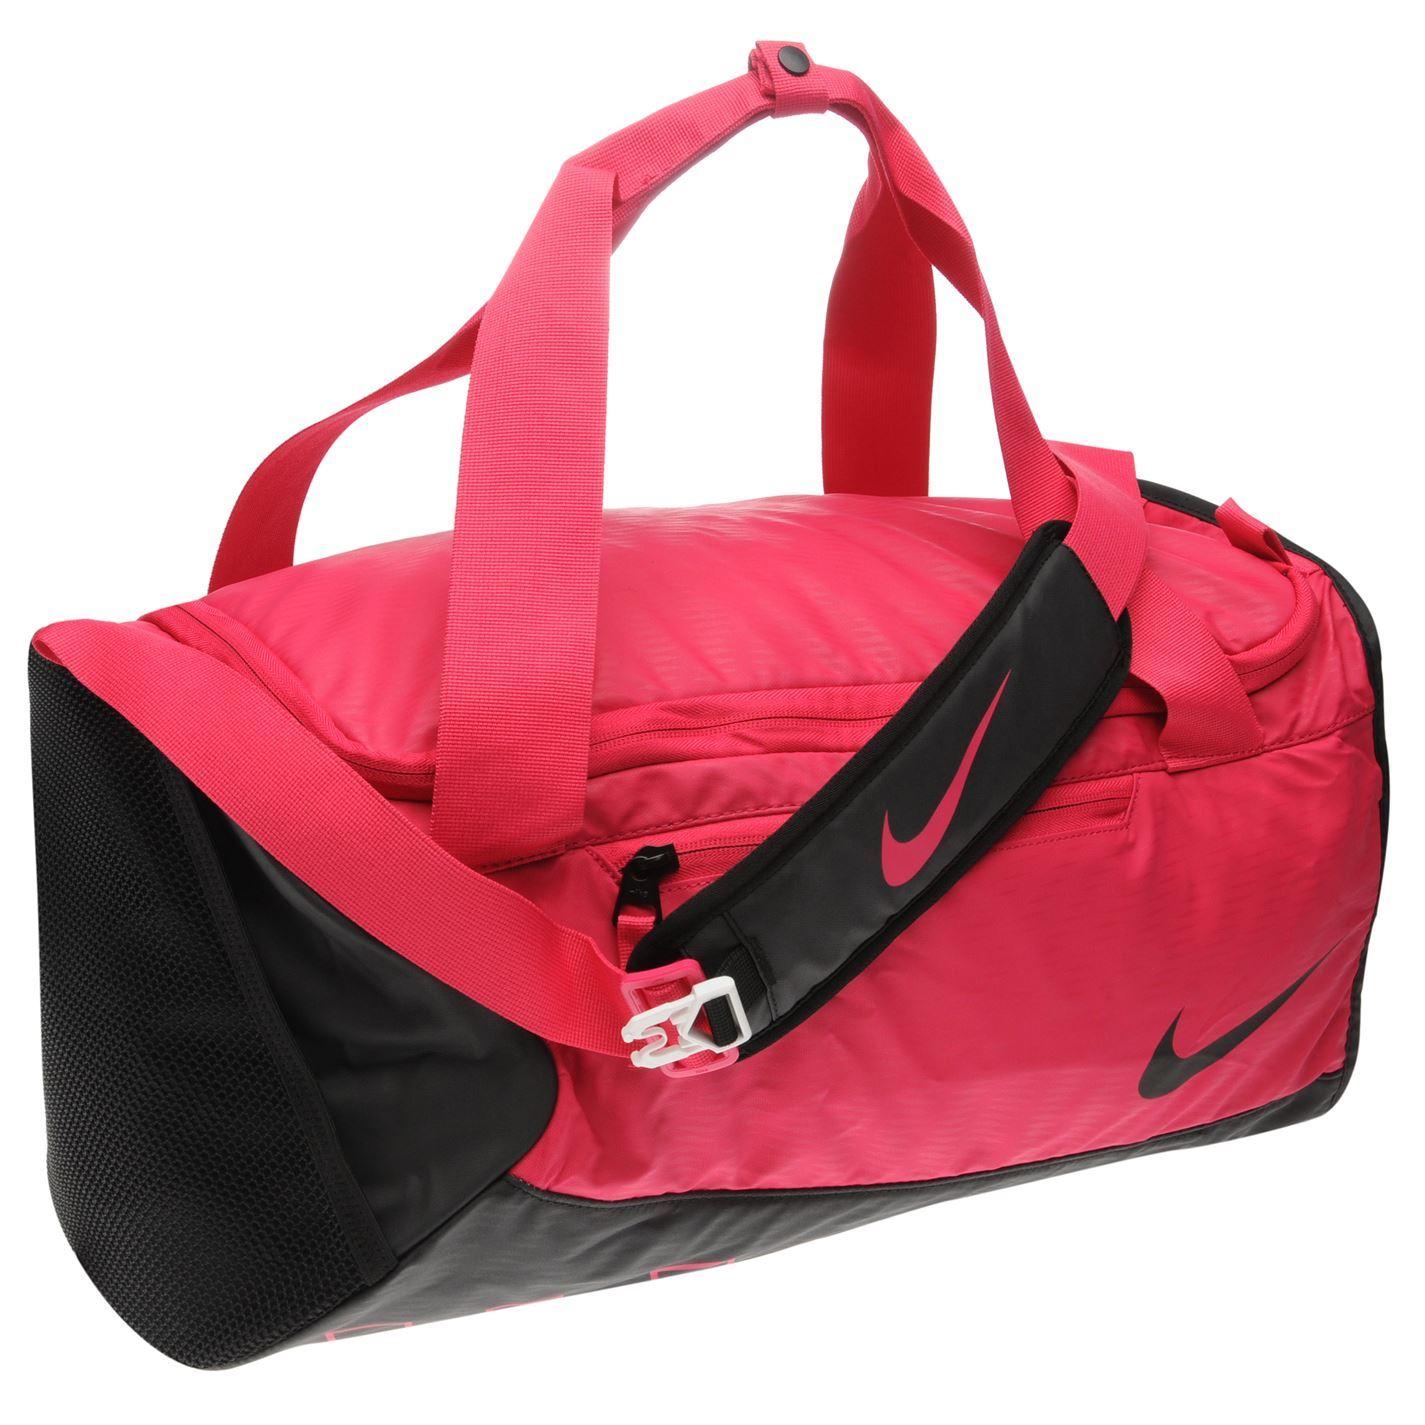 bd5d71761318 Nike Gym Bag Pink And Black